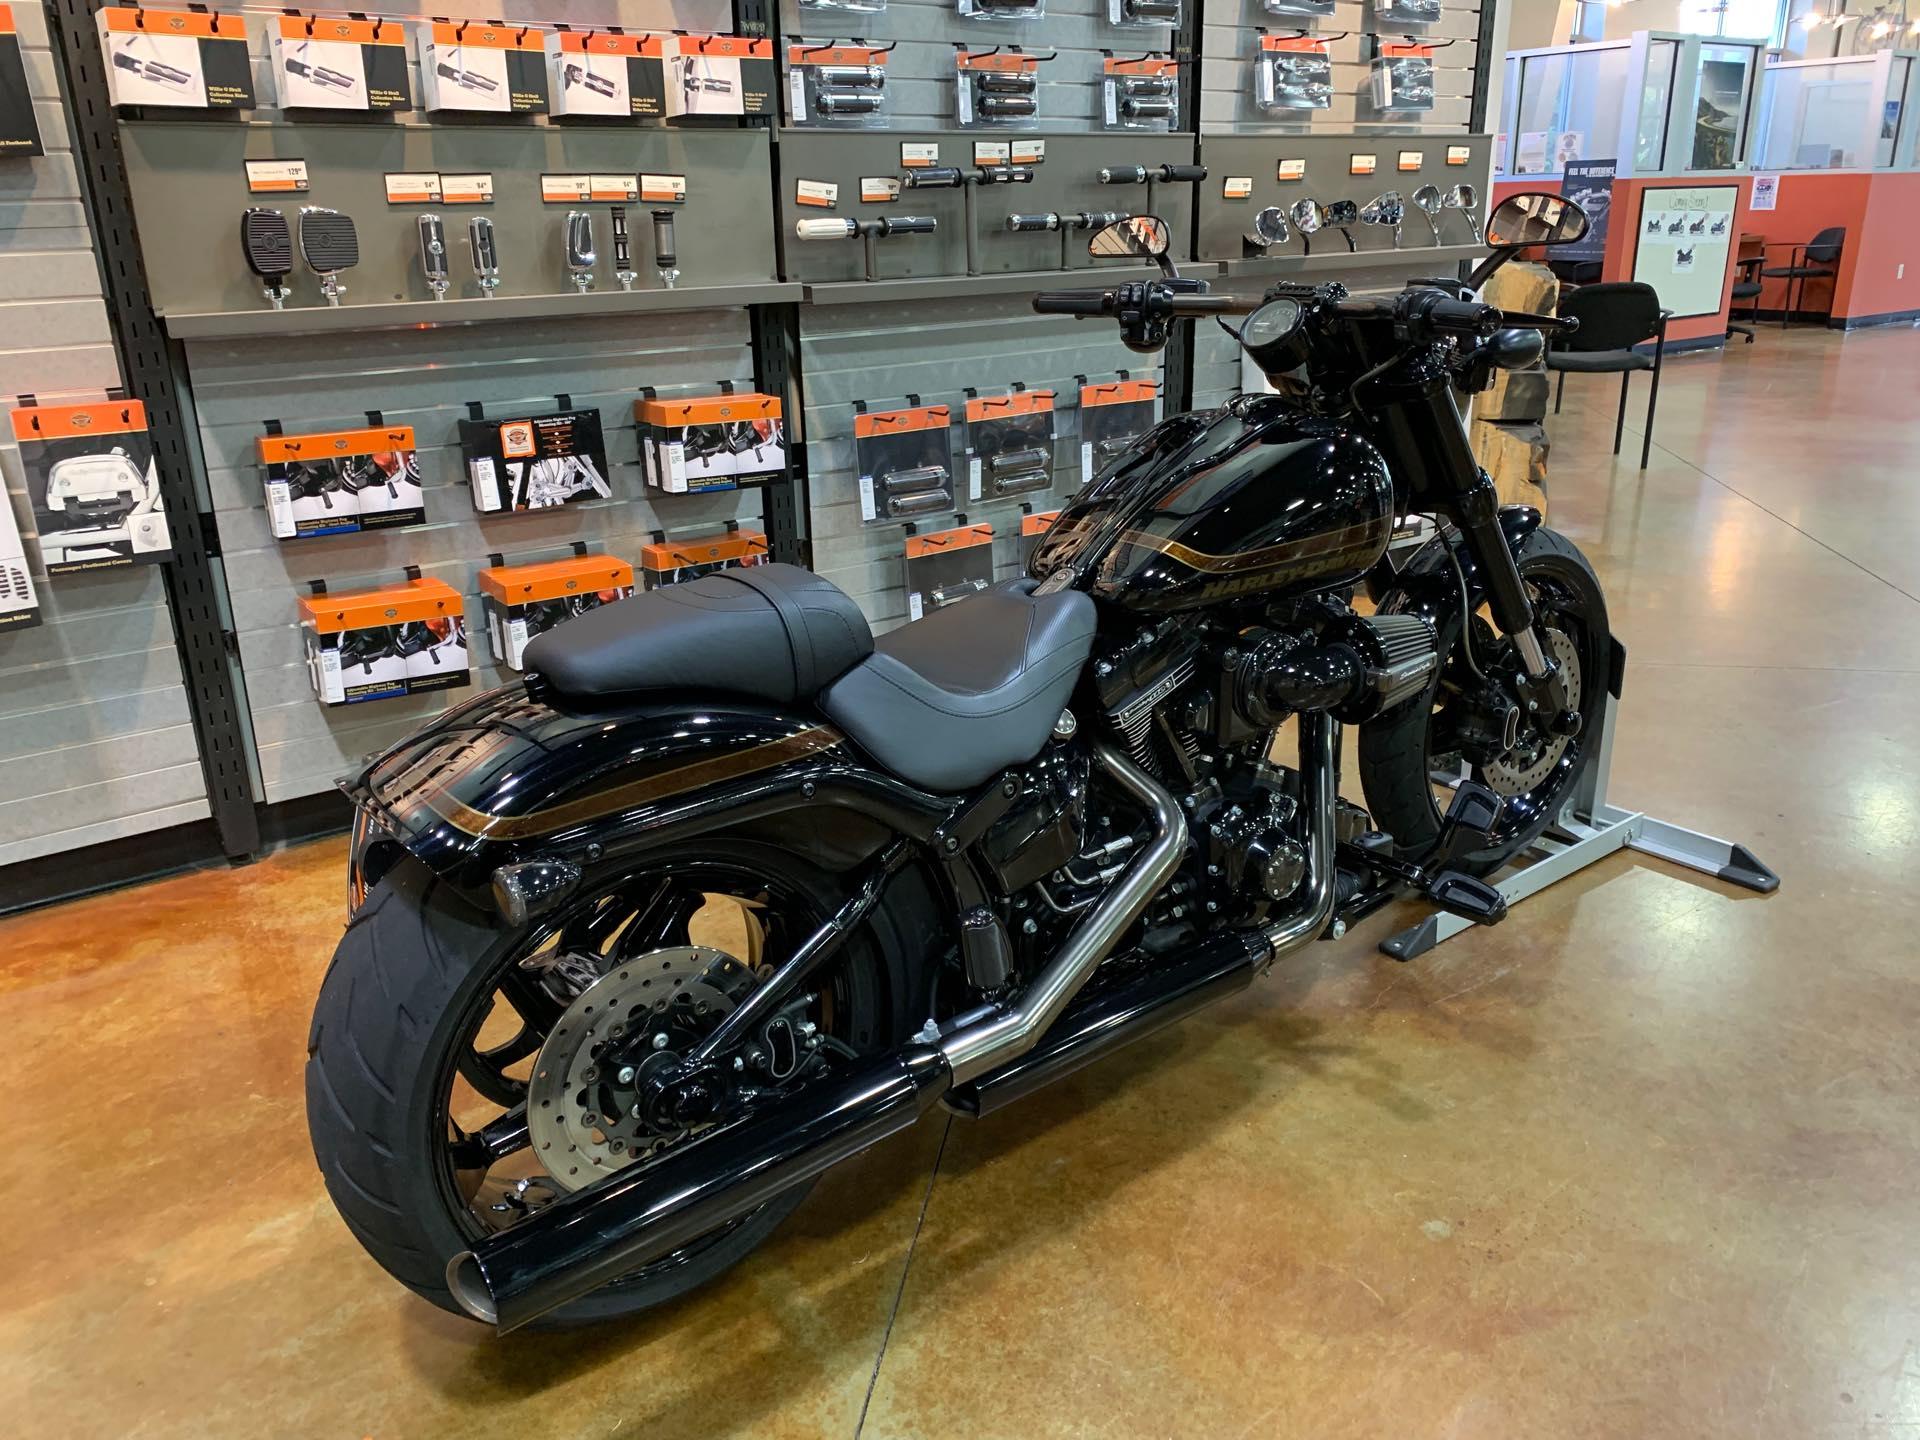 2017 Harley-Davidson Softail CVO Pro Street Breakout at Colonial Harley-Davidson